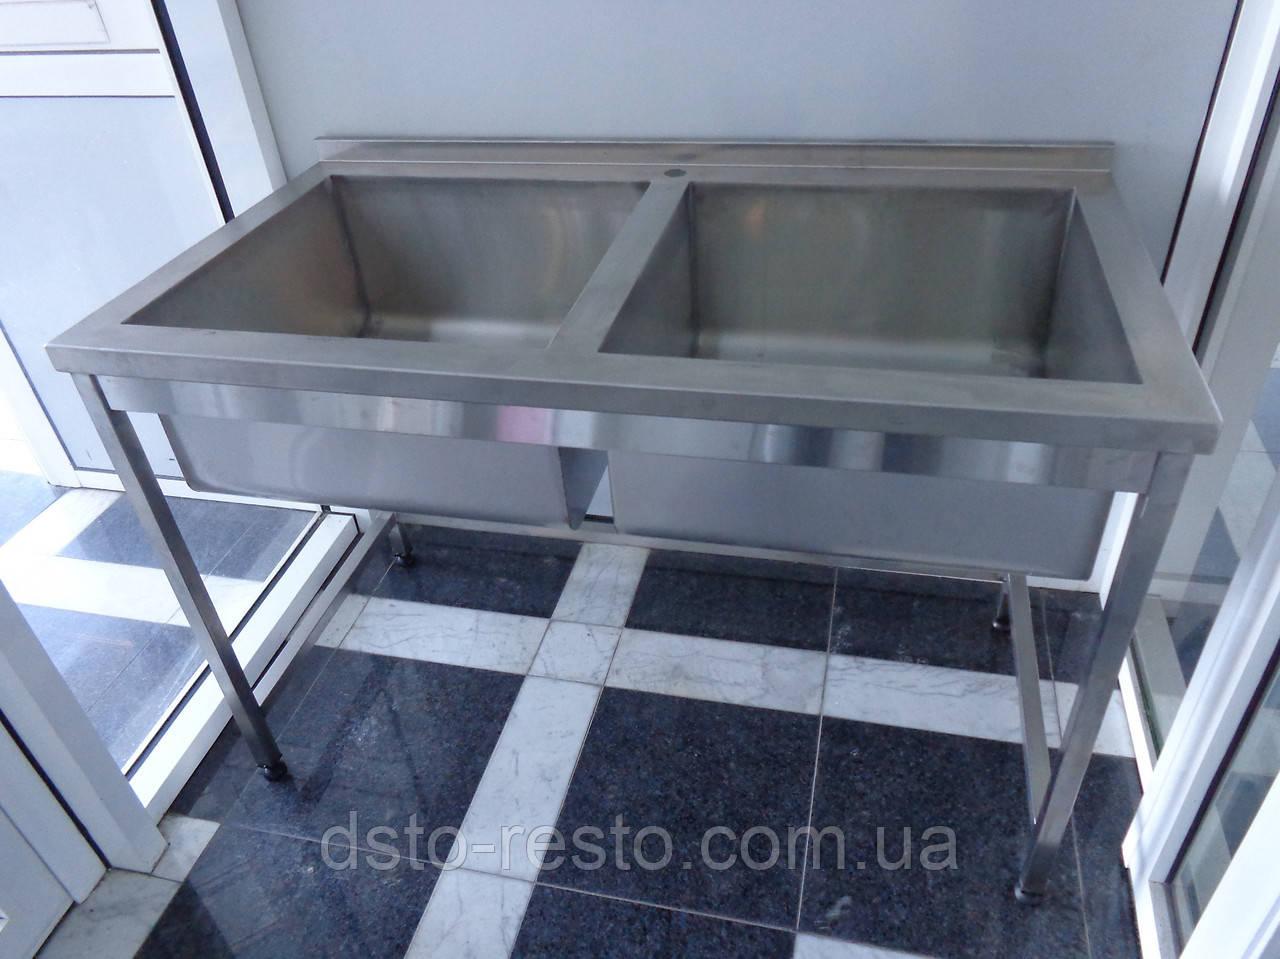 Ванна моечная 2-х секц. с бортом 1000/600/850 мм